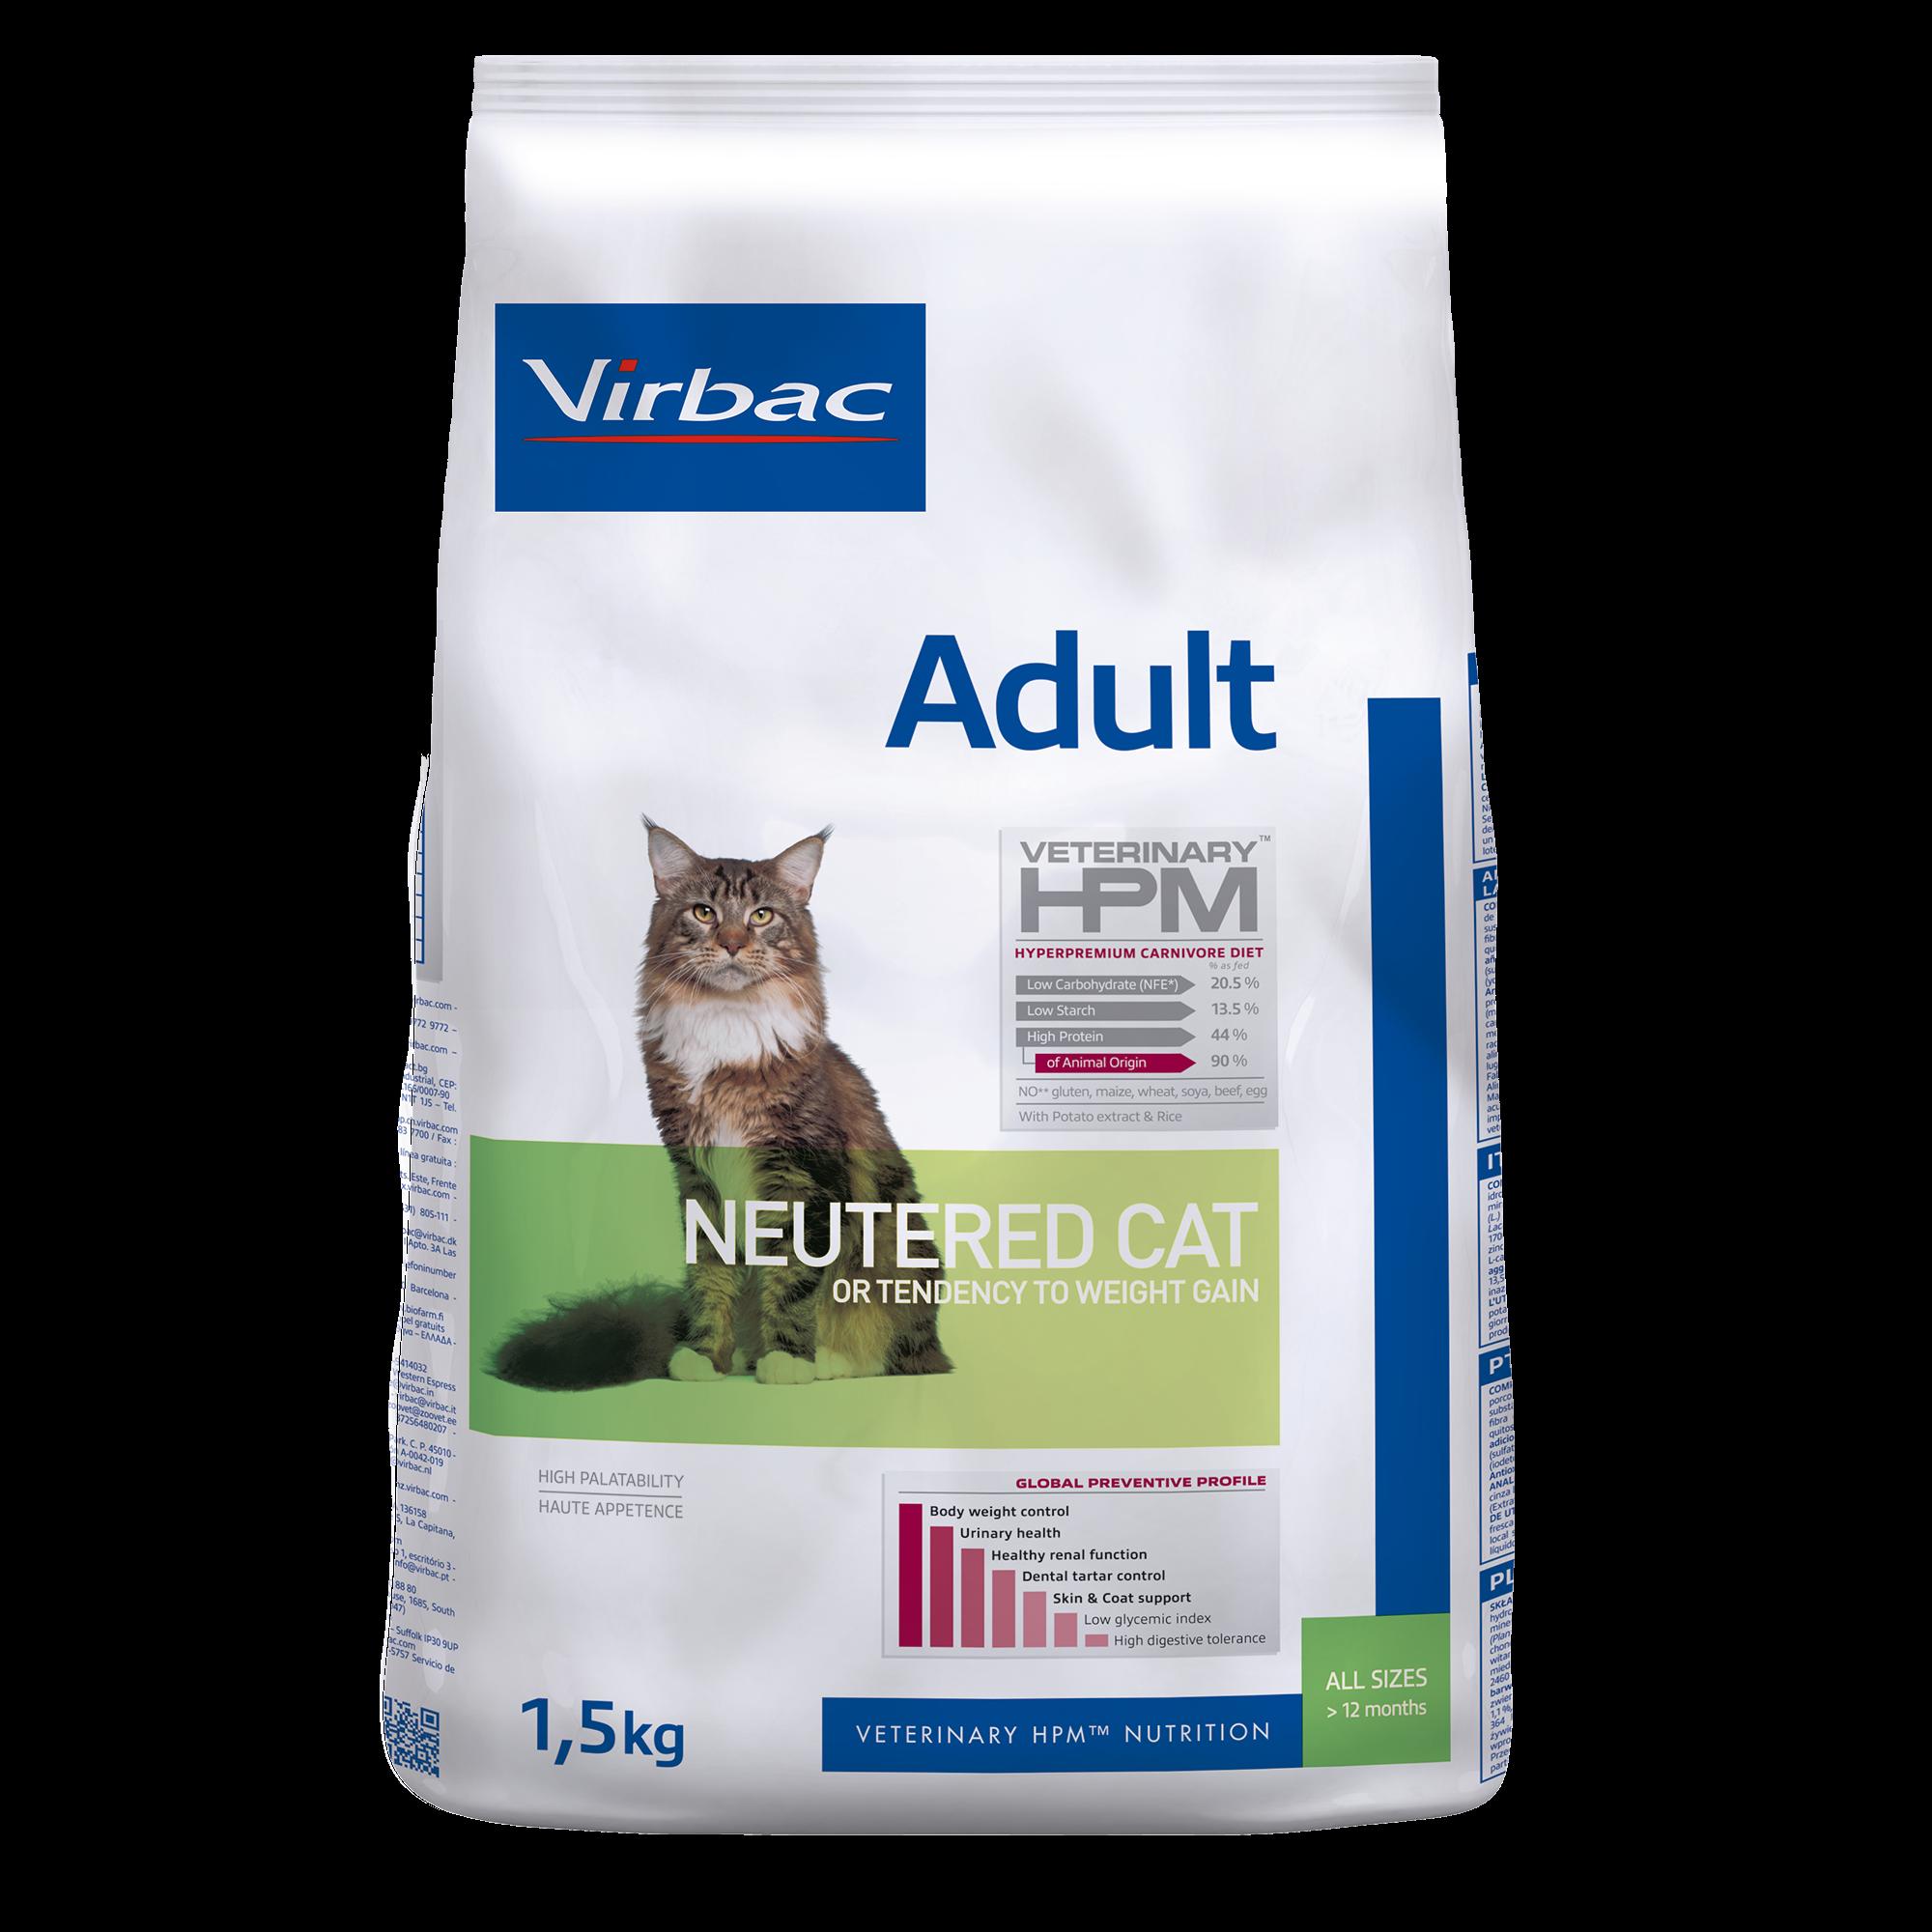 Adult Neutered Cat - 1,5 kg